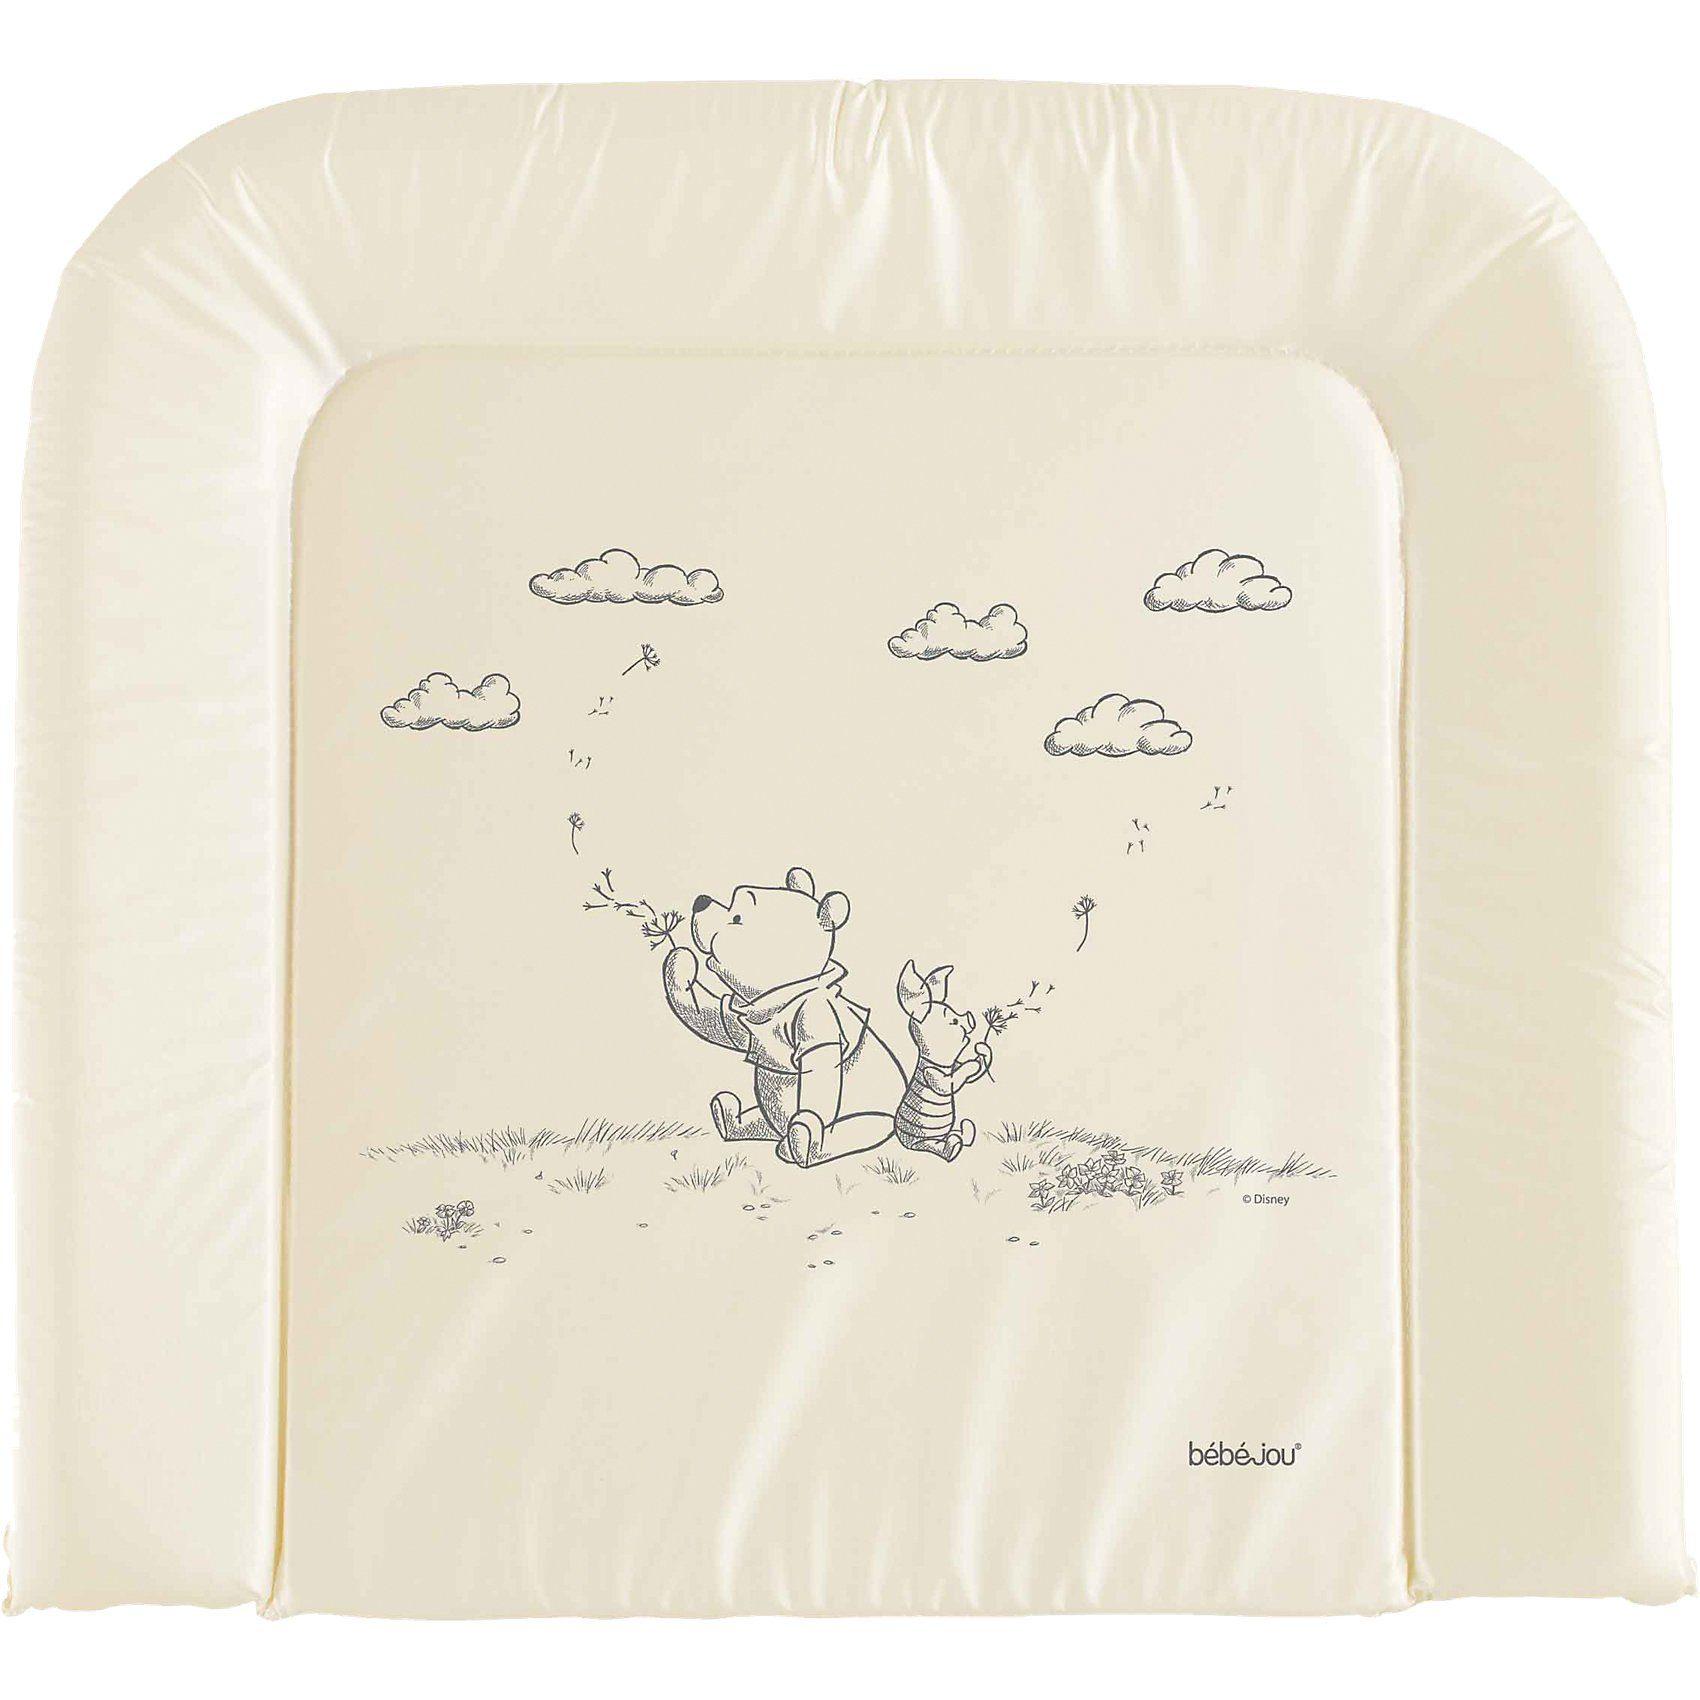 bébé-jou Wickelauflage Wishing Pooh, perlmut, 75 x 80 cm